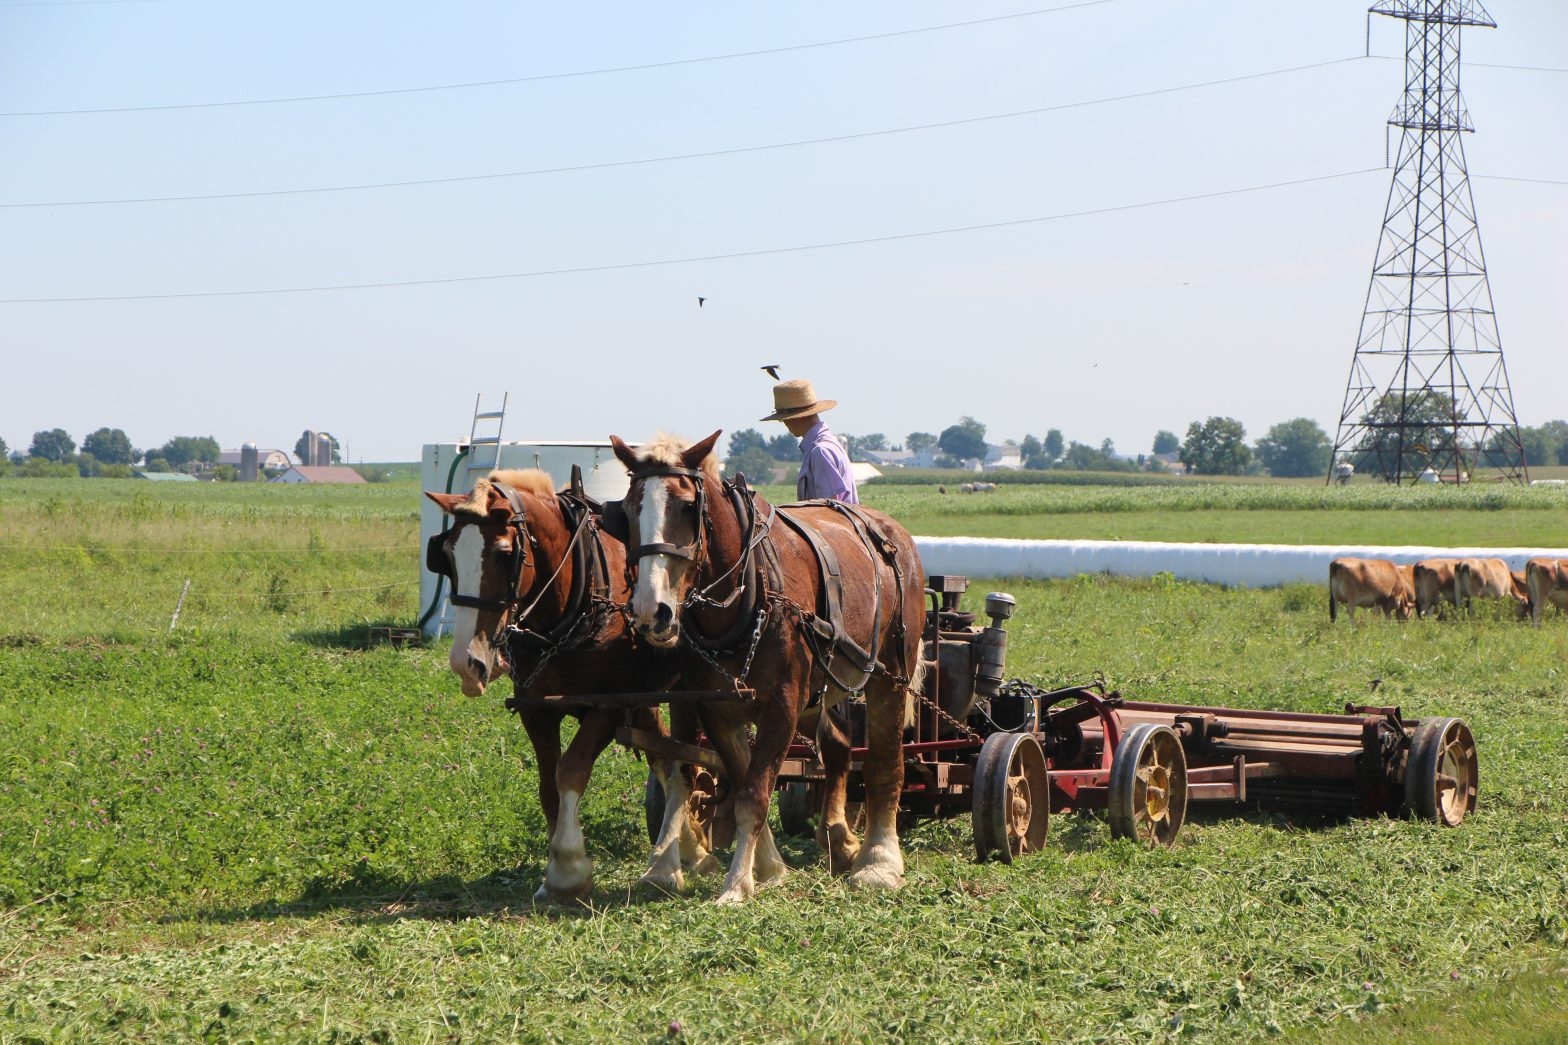 dutch country amish pennsylvania roadtrip amerika vs usa lancaster